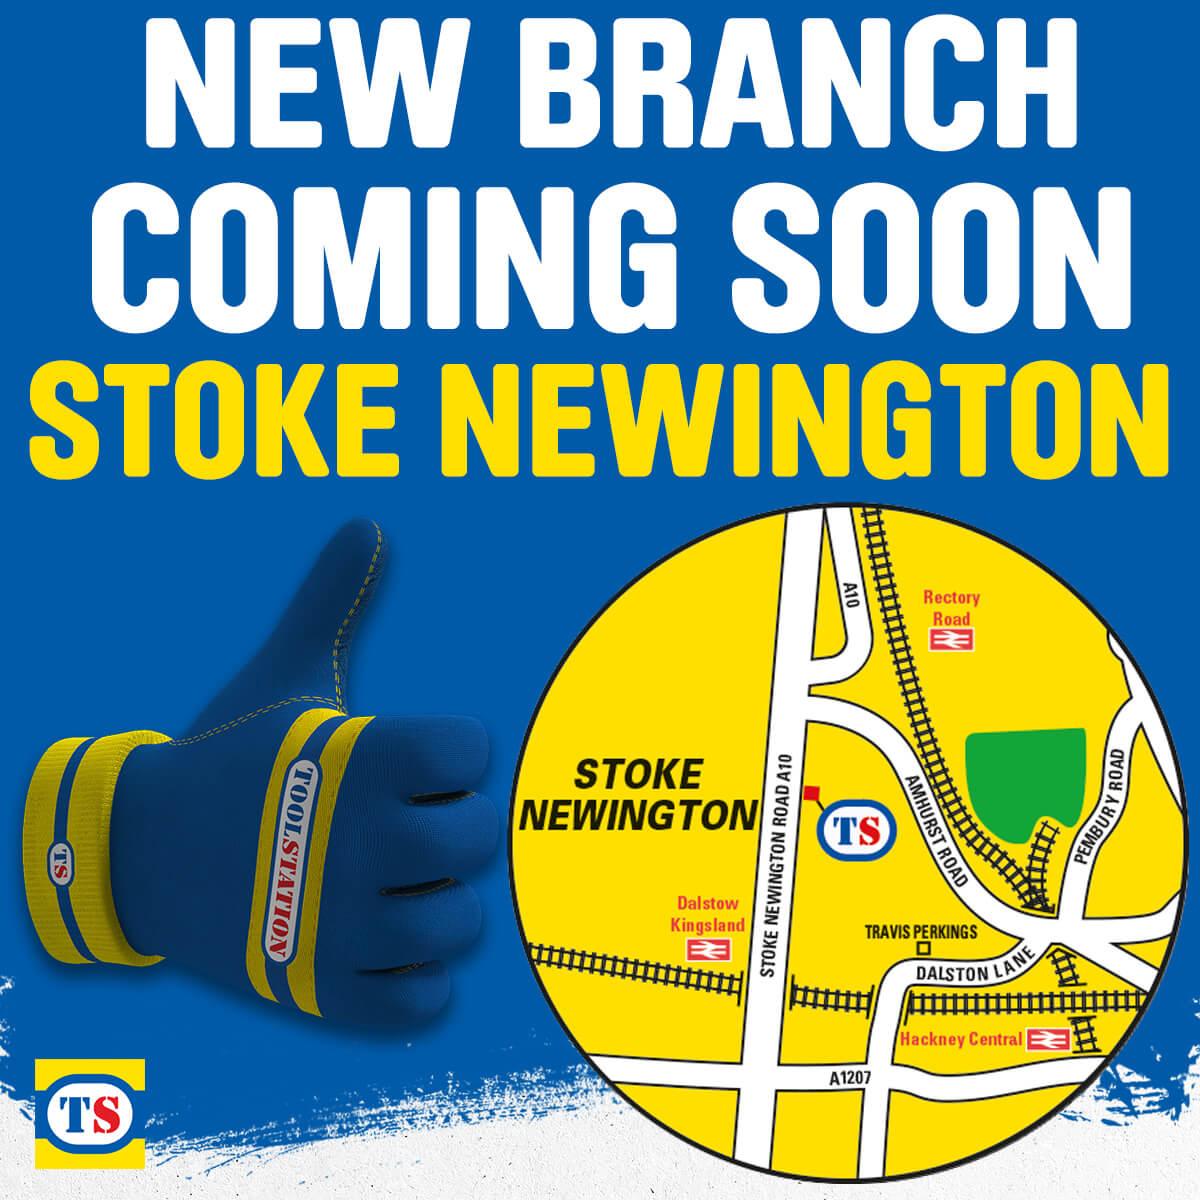 Stoke Newington Toolstation Coming Soon